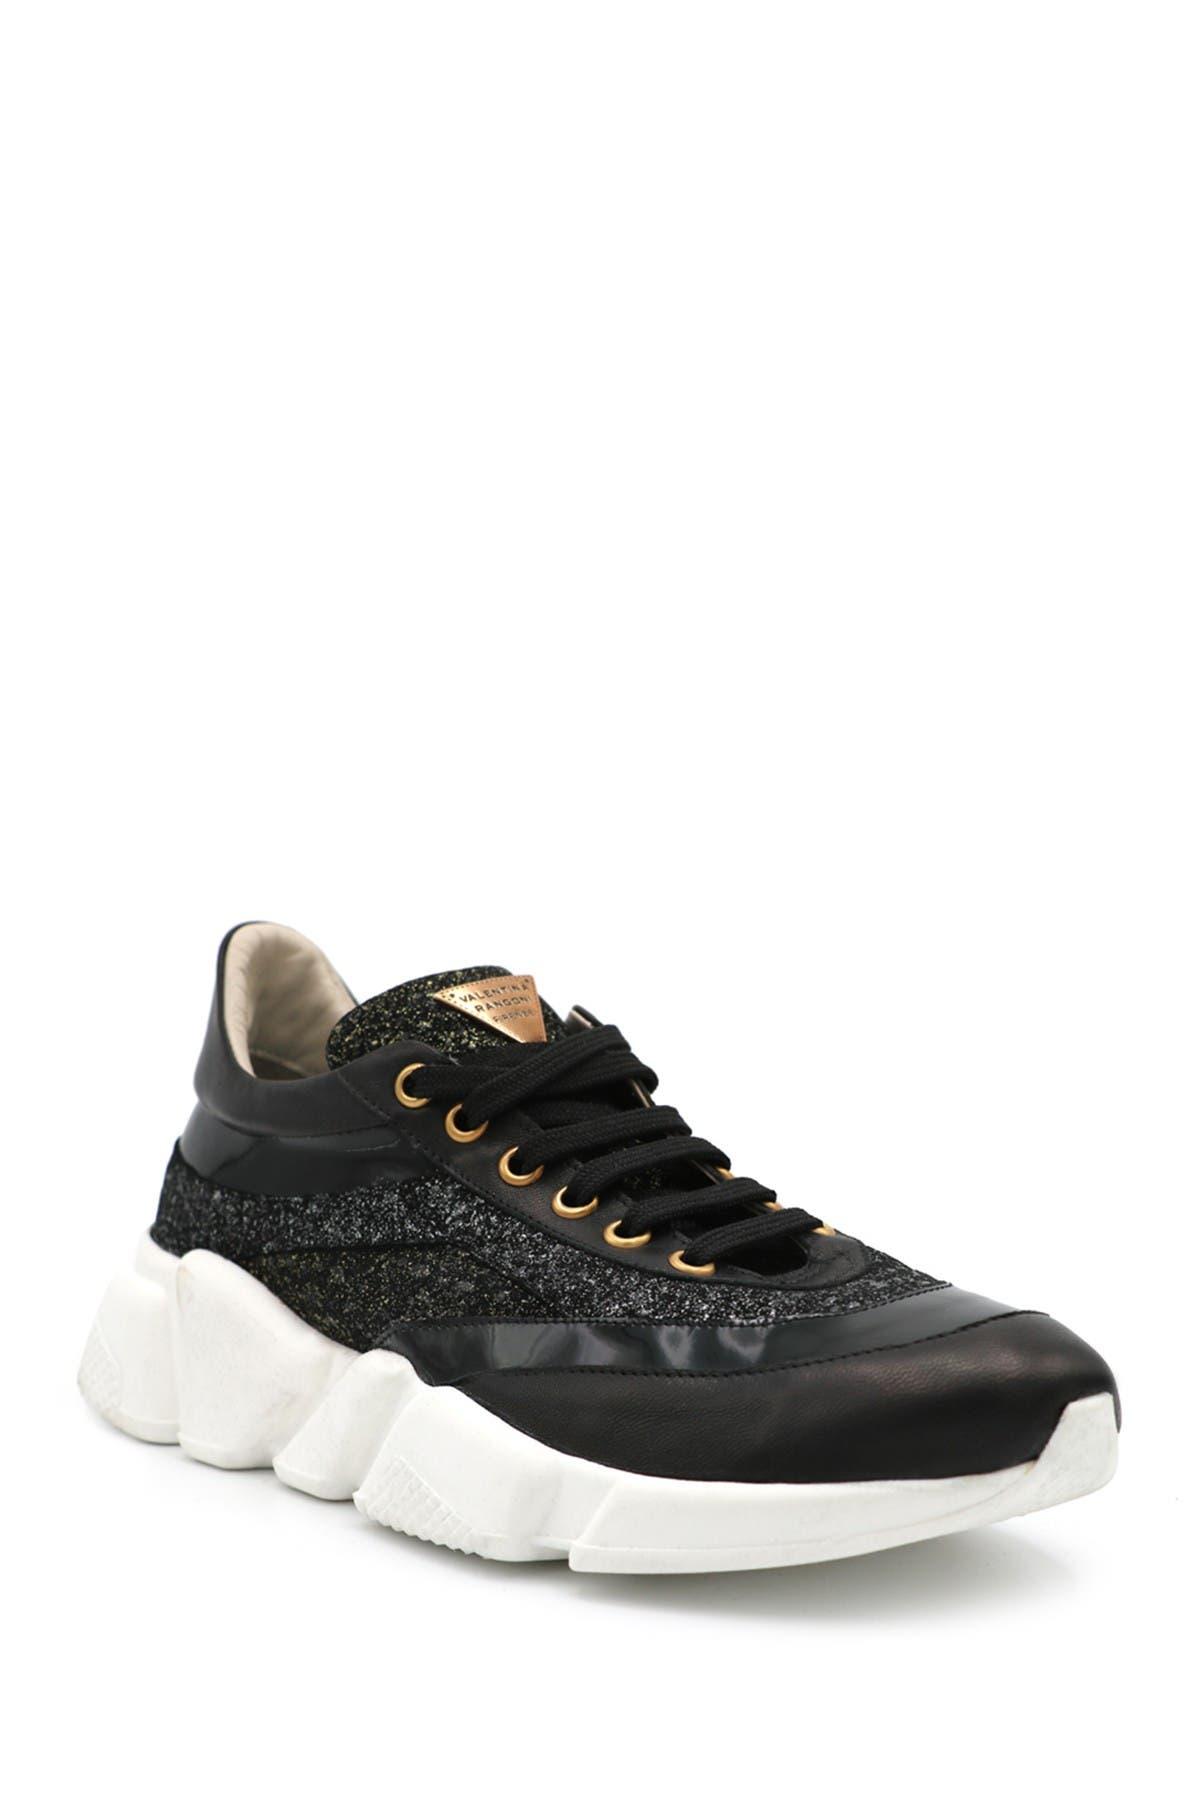 Image of VALENTINA RANGONI Pompeo Sneaker